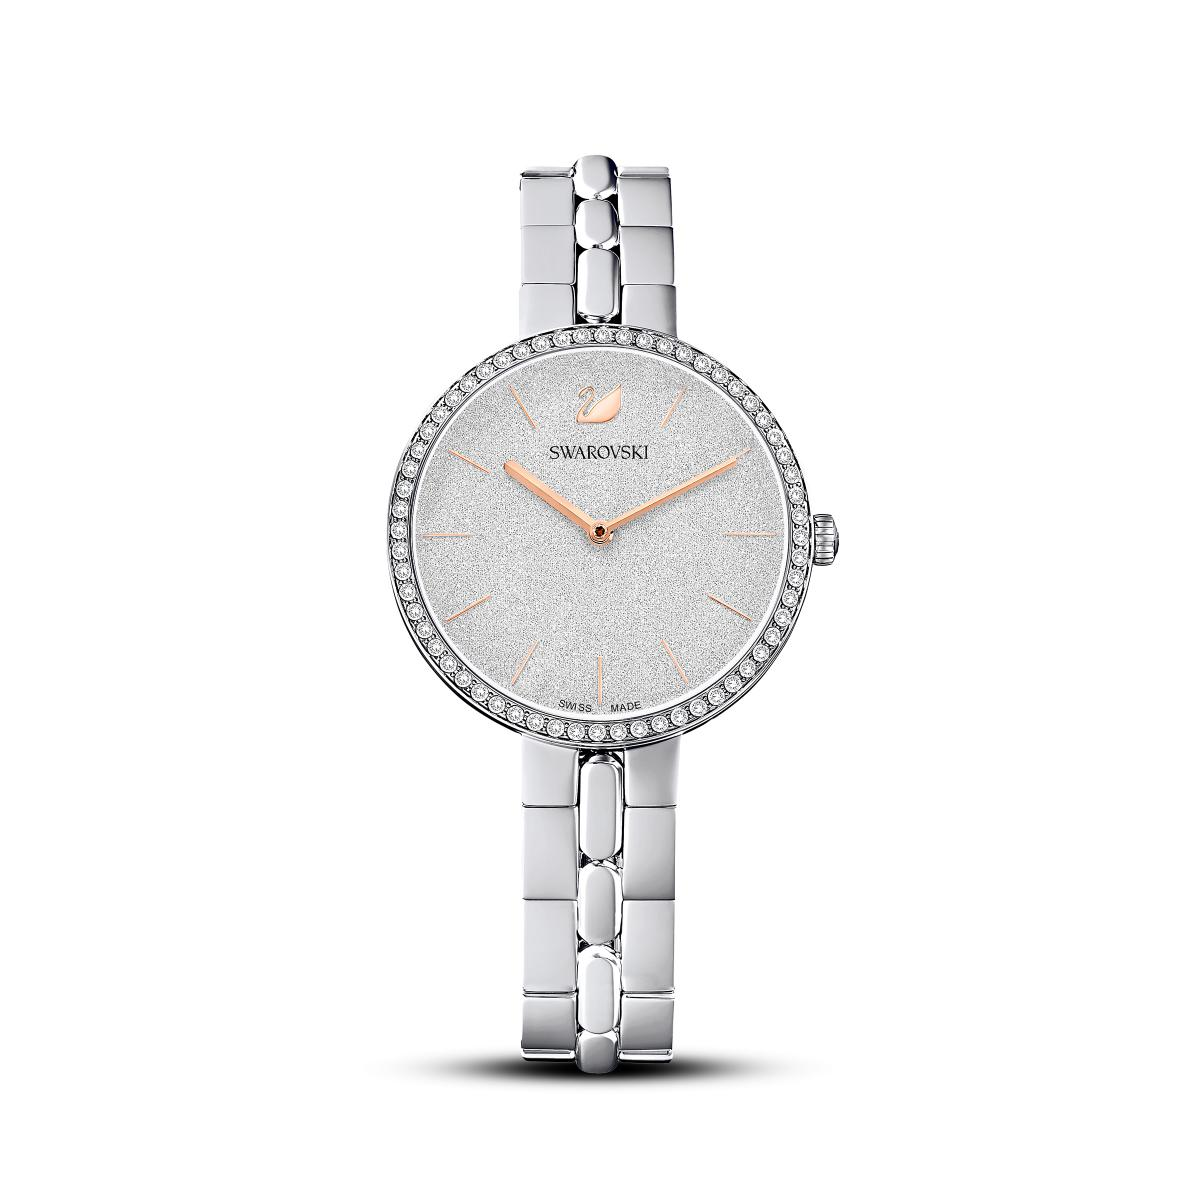 MONTRES 5517807 - COSMOPOLITAN - Swarovski montres - Modalova